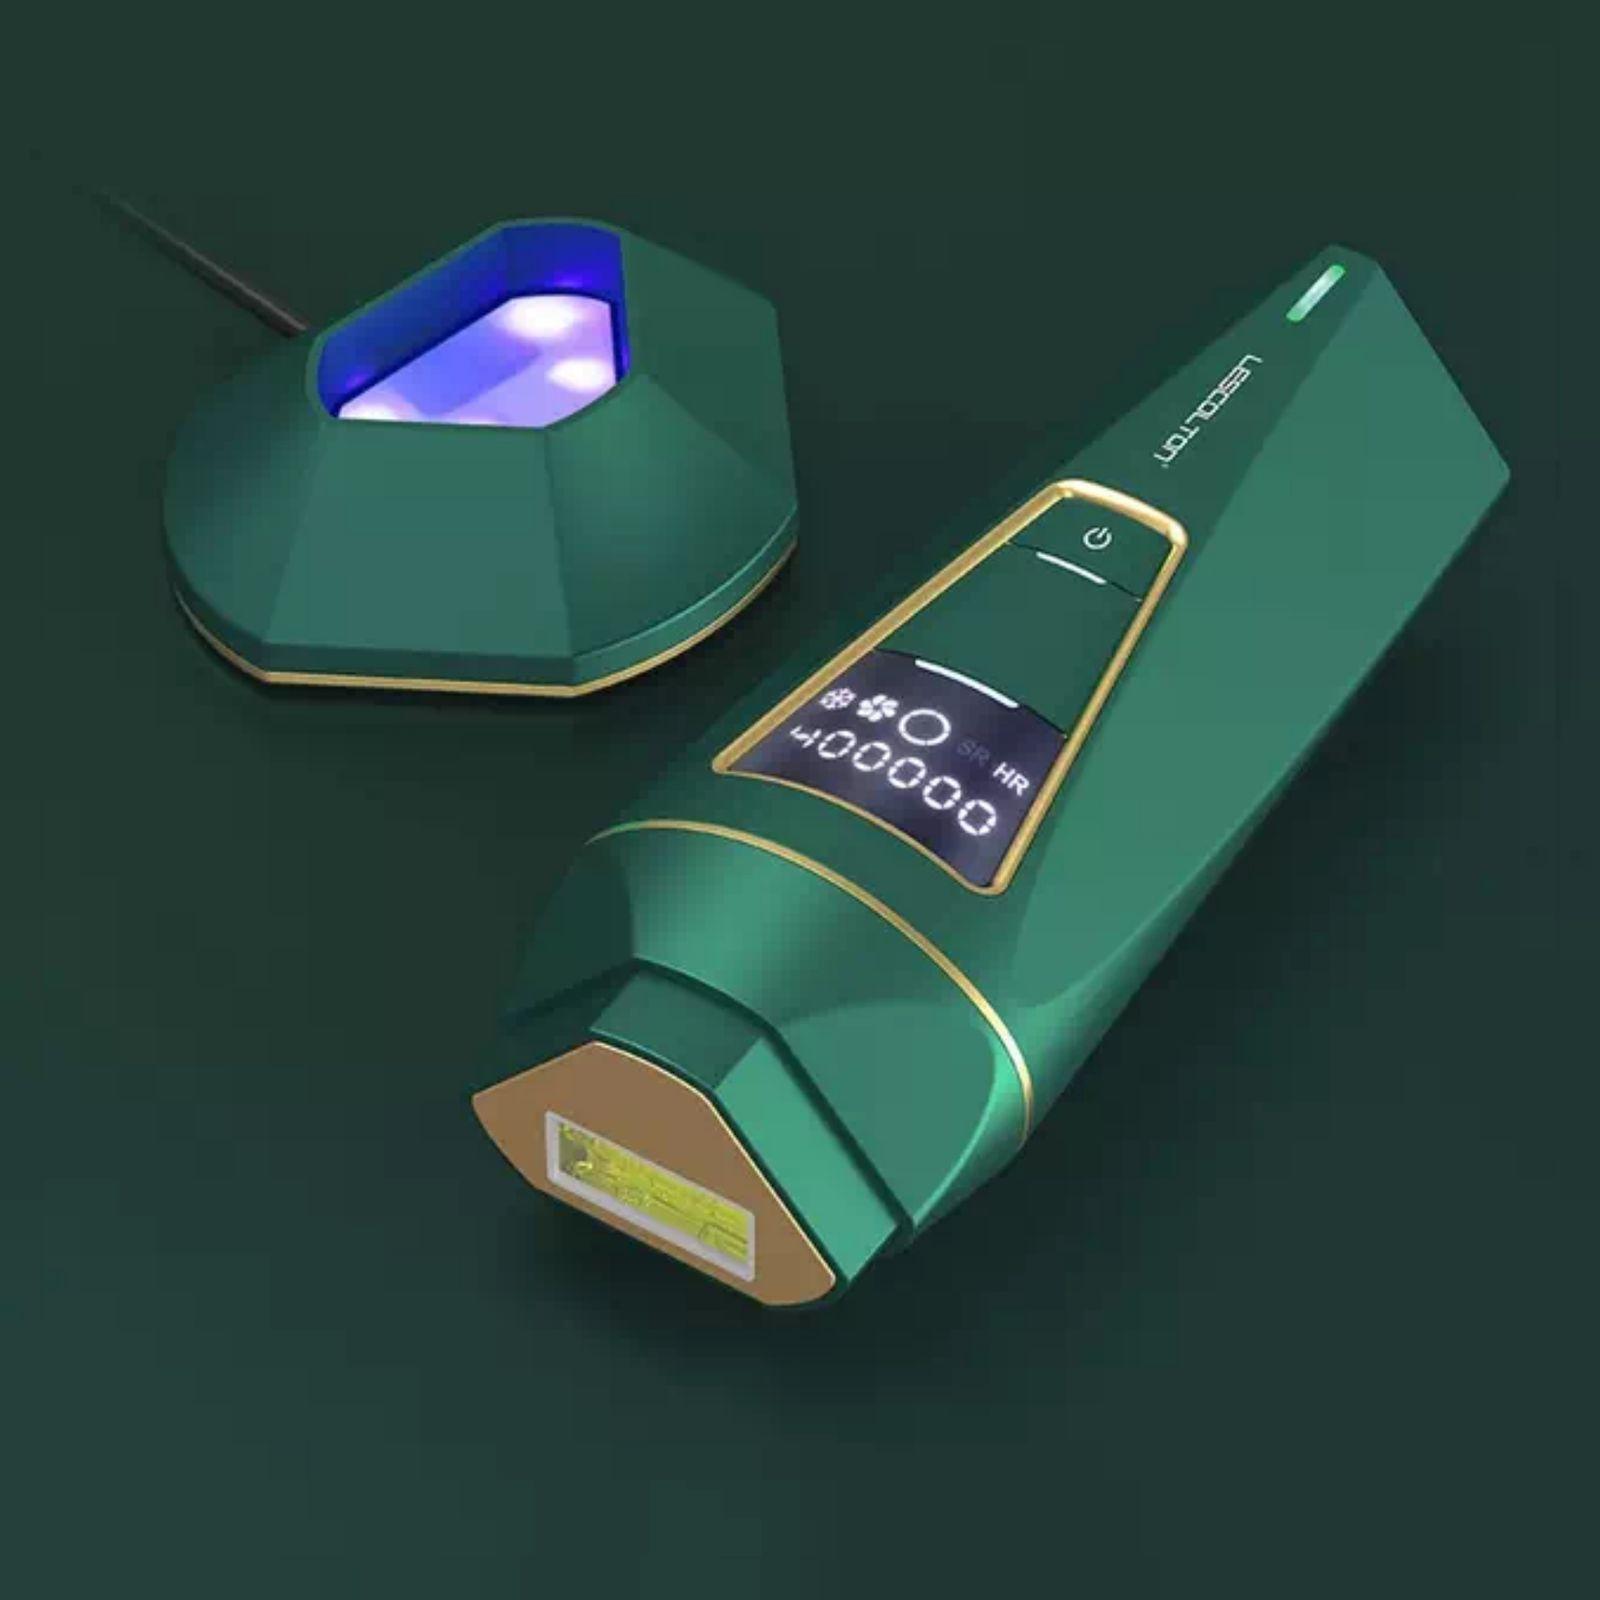 لیزر بدن لسکلتون مدل T015C -  - 5